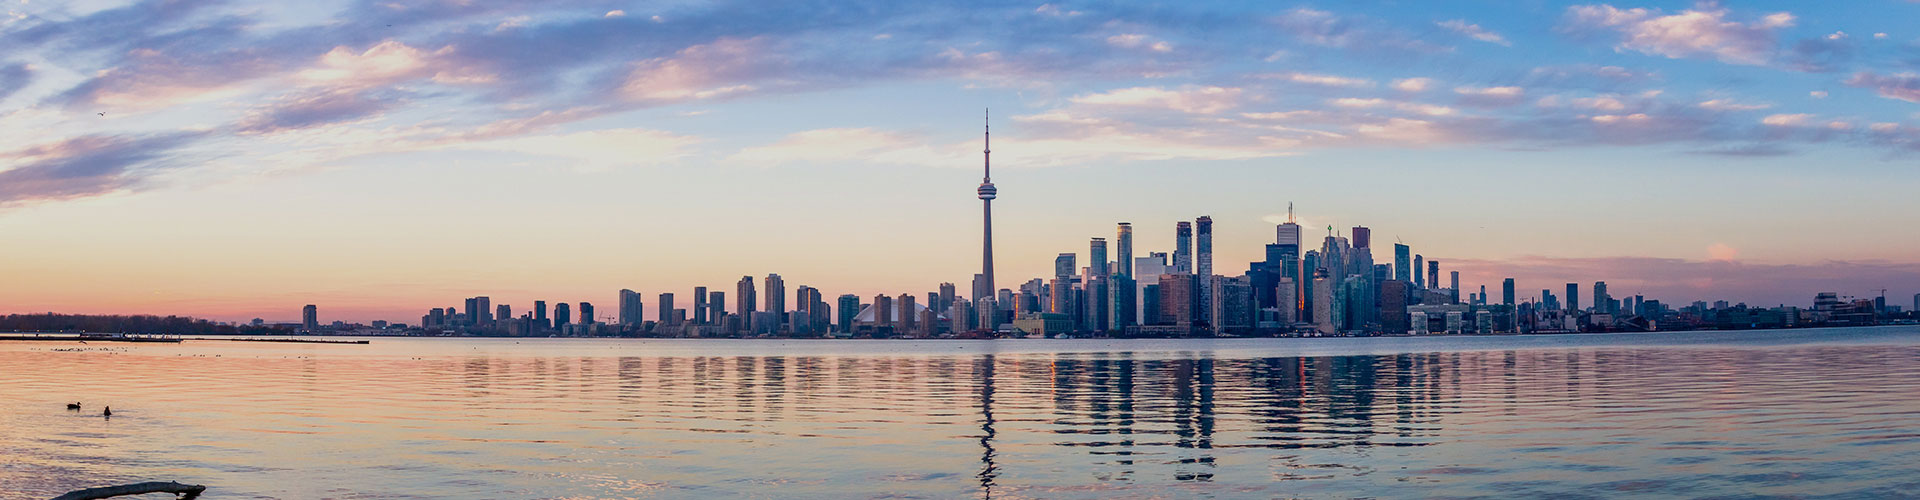 Landmark photograph of Canada